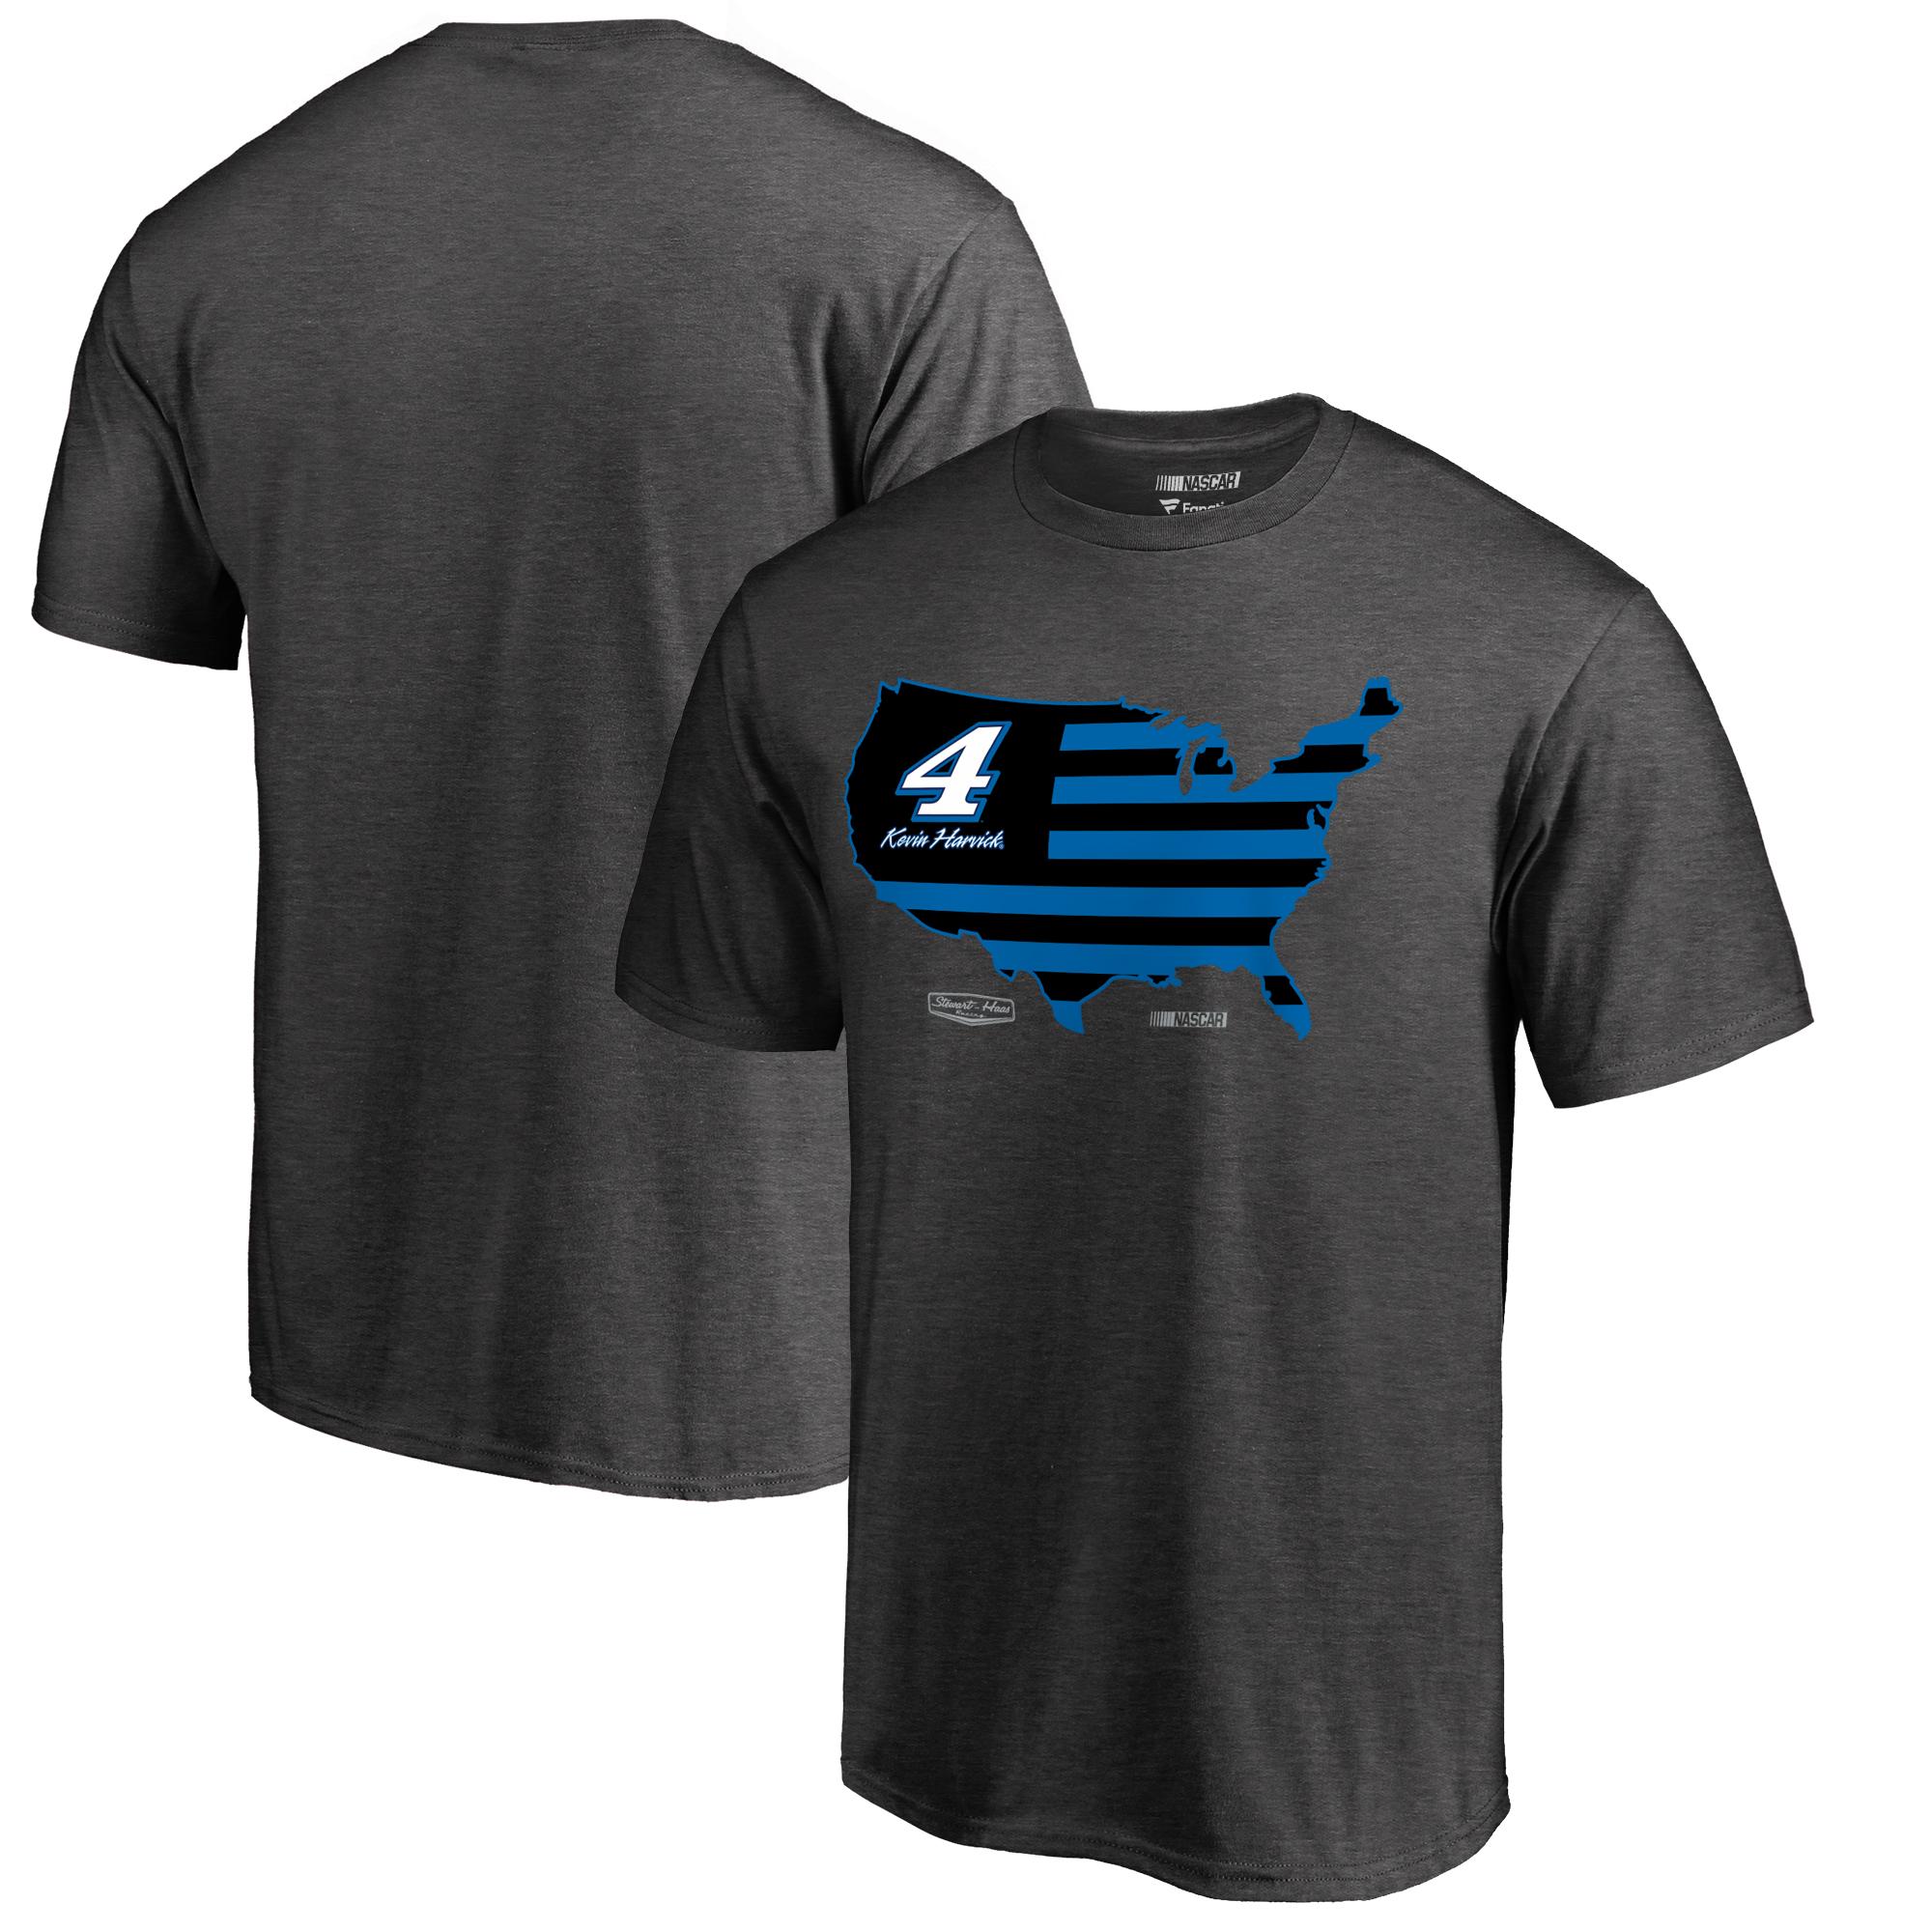 Kevin Harvick Fan Nation T-Shirt - Charcoal